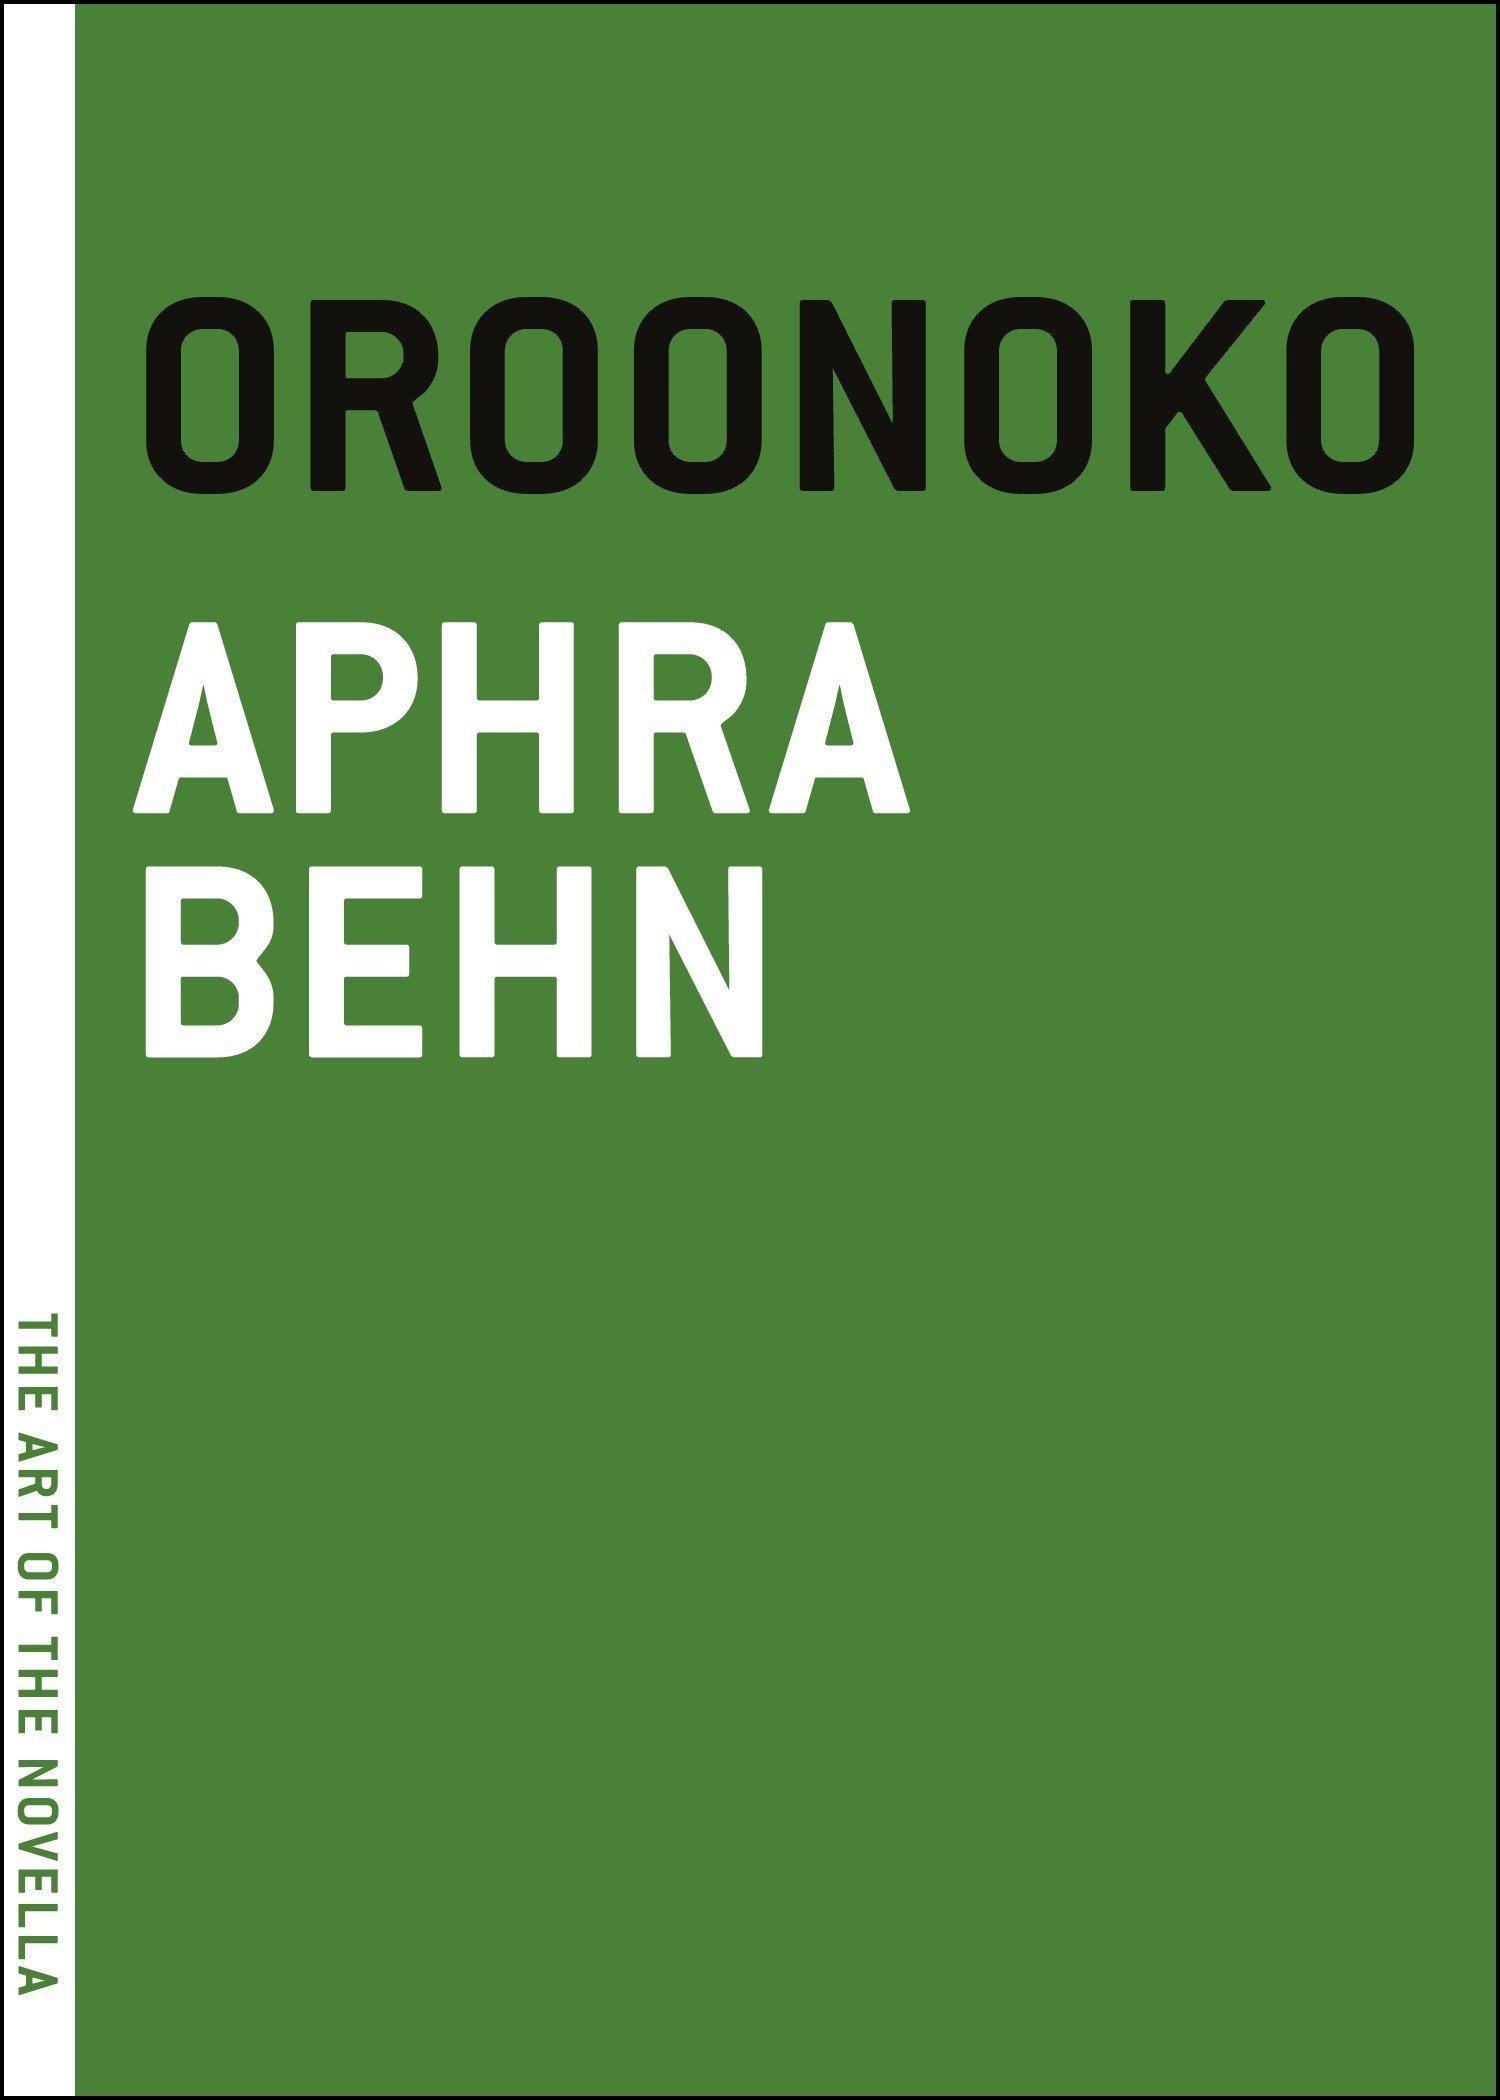 Oroonoko: Or, The Royal Slave, A True Story (The Art of the Novella) pdf epub